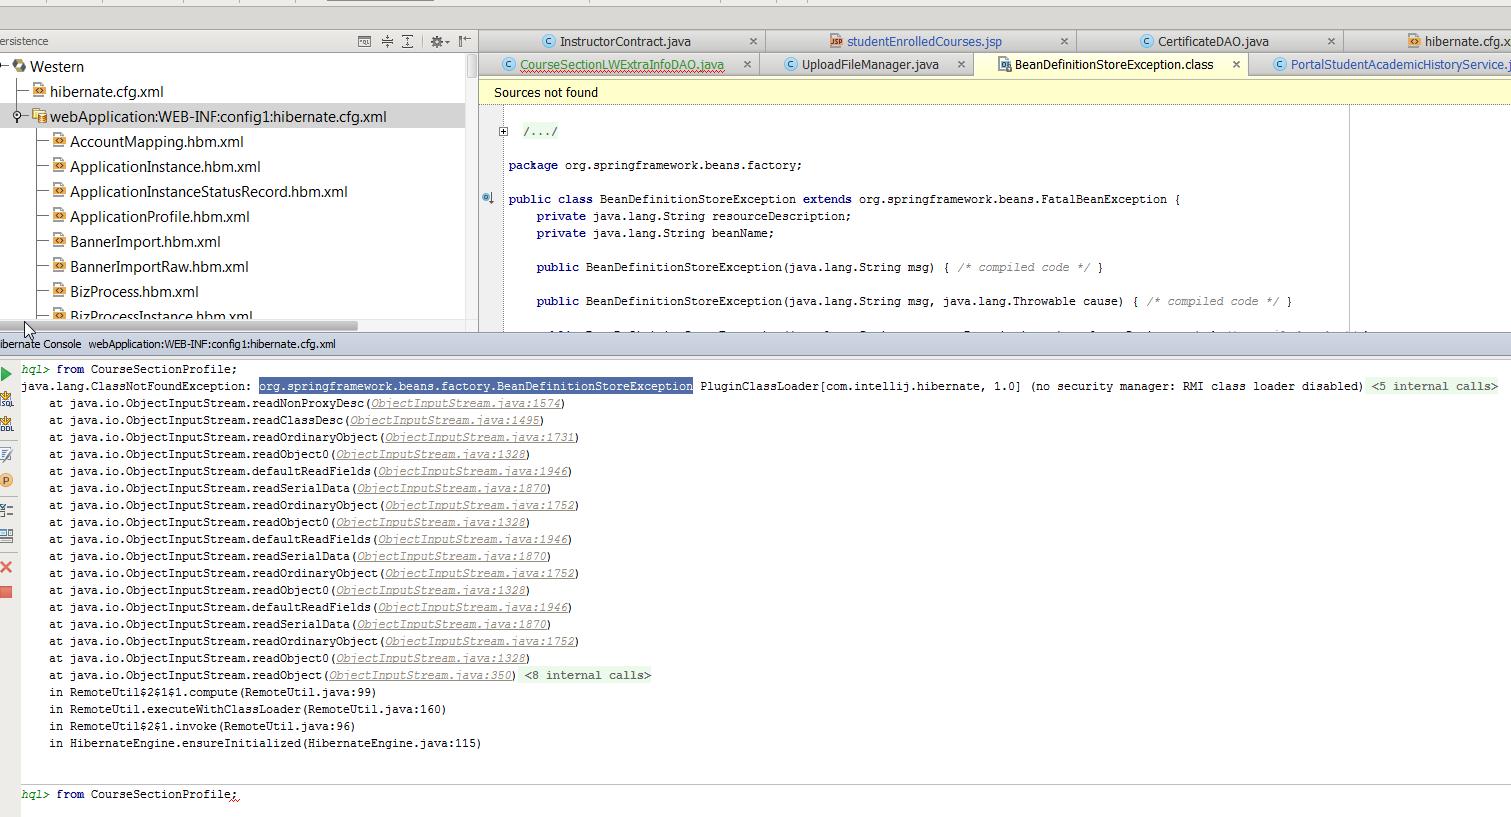 IntelliJ_hibernate_console_error.png